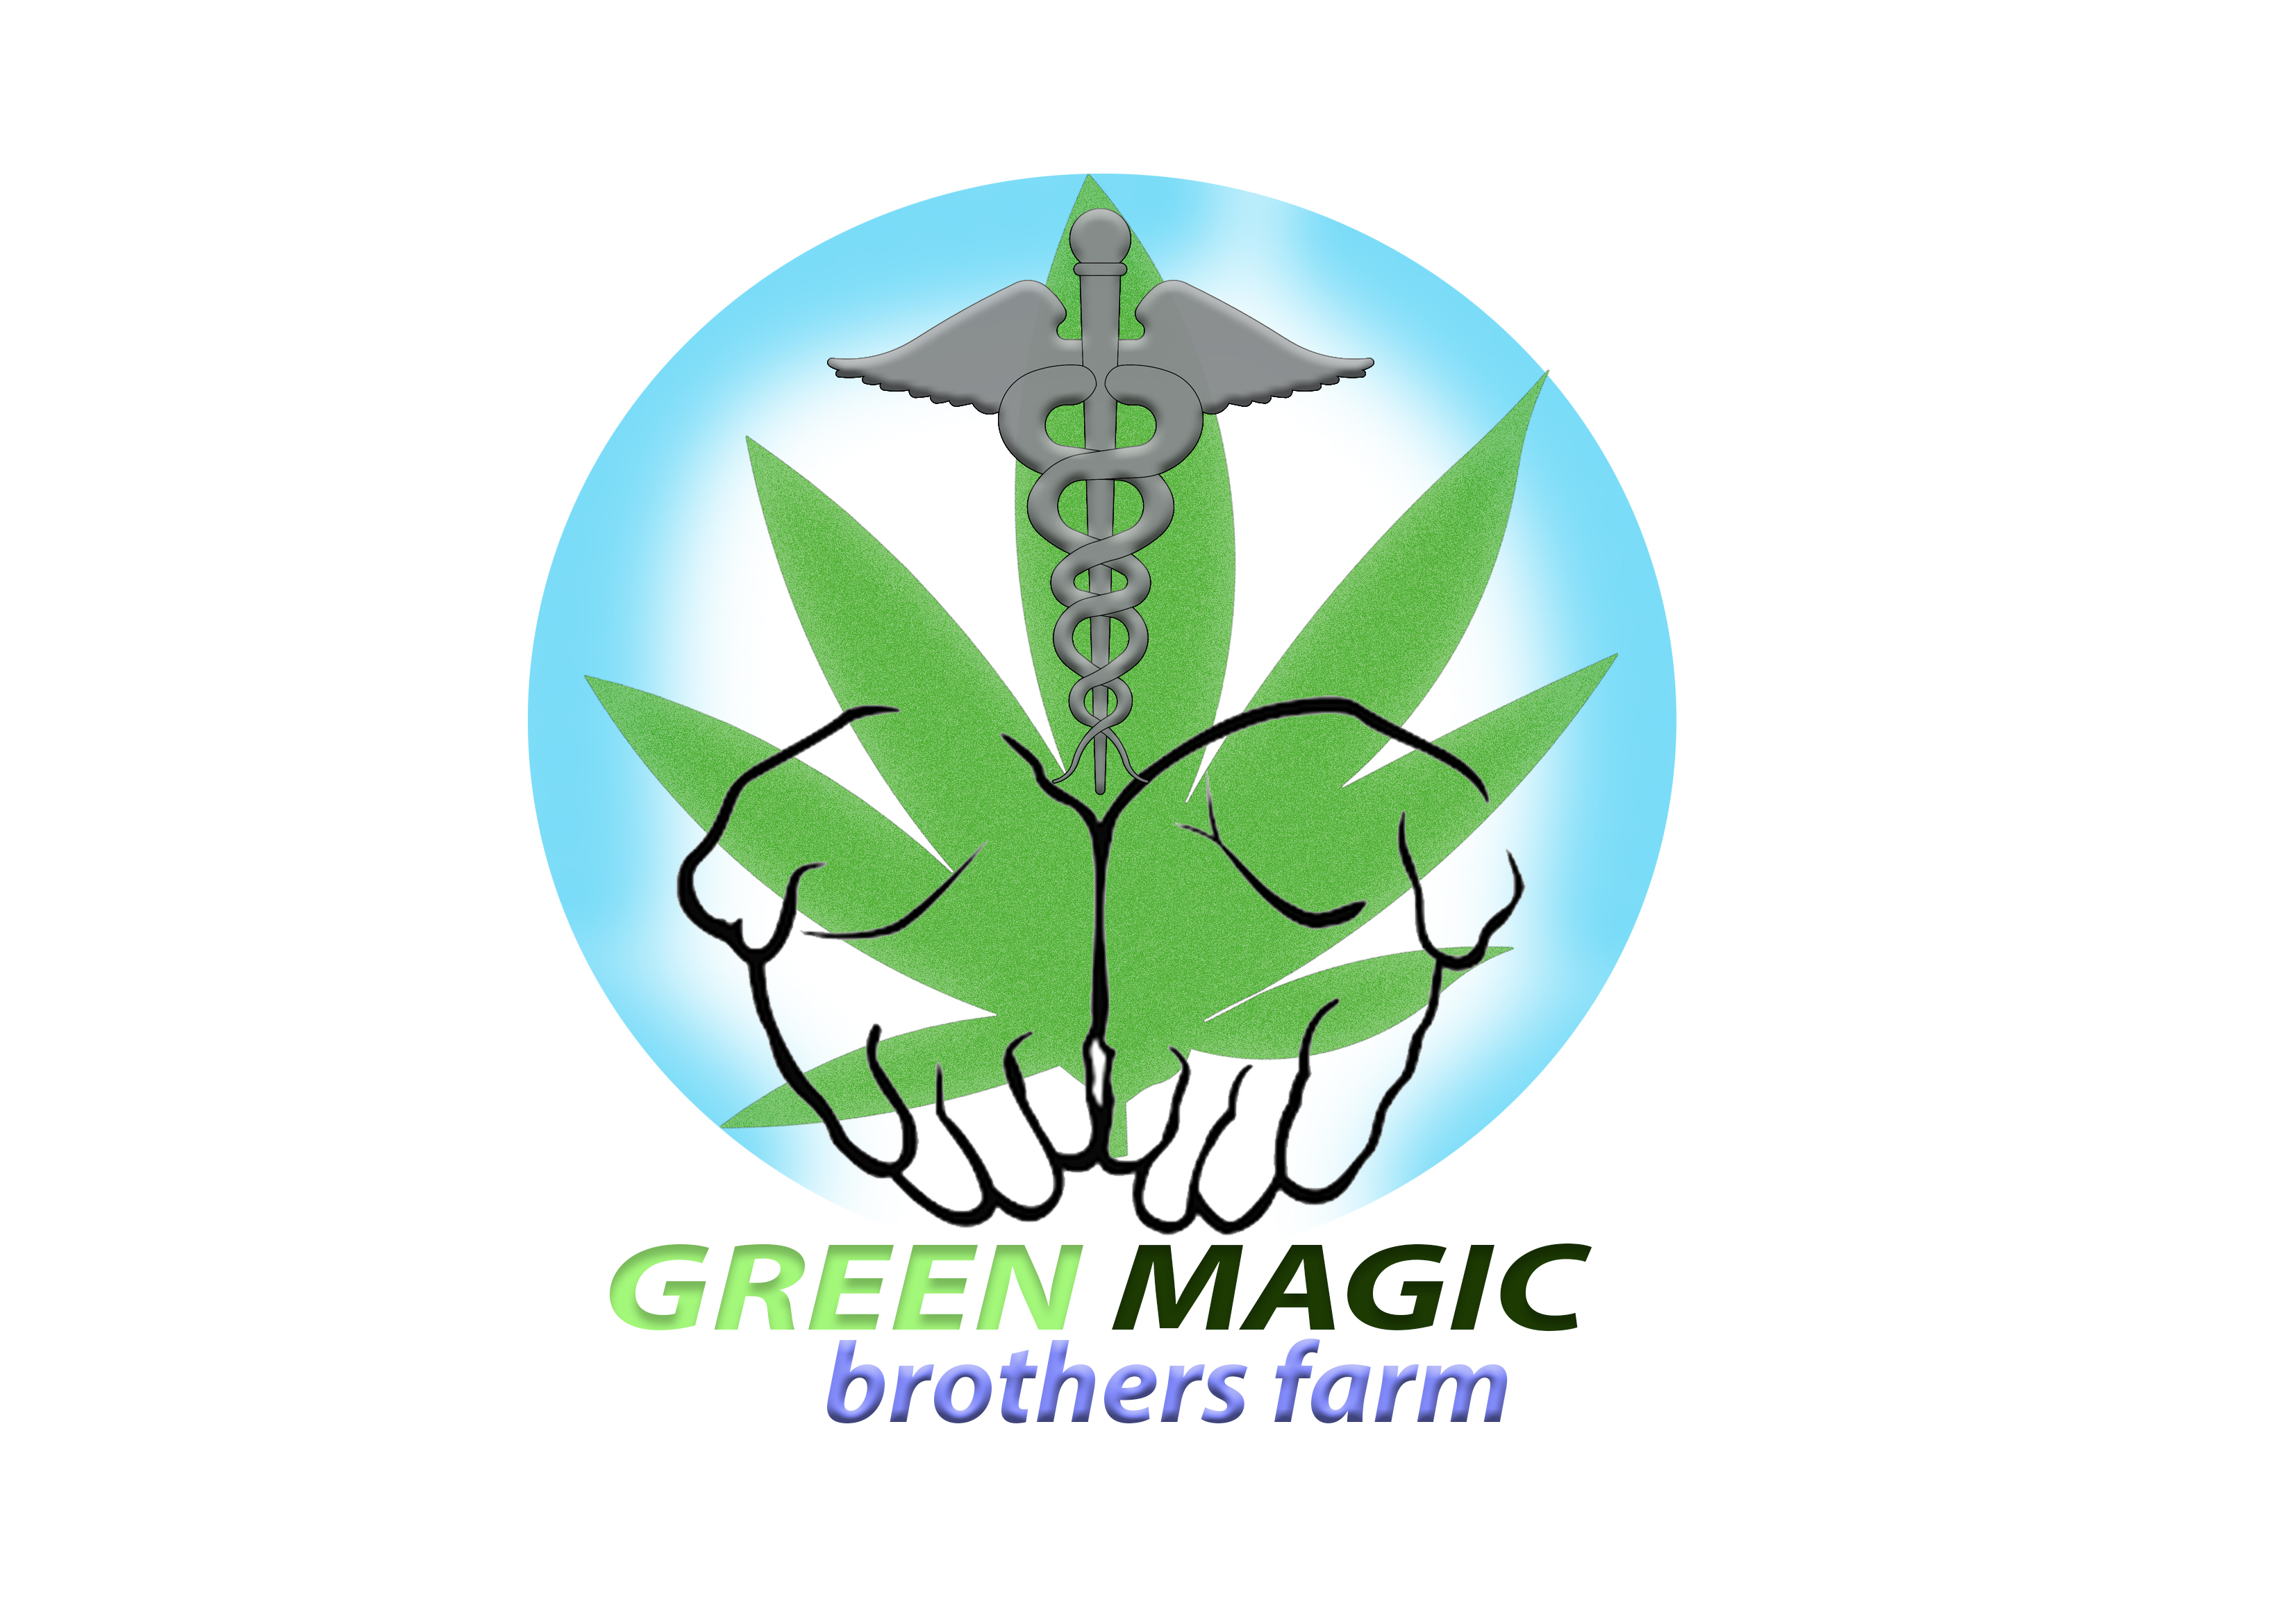 Logo Design by Niño rodel Adan - Entry No. 69 in the Logo Design Contest Green Brothers Farm Logo Design.